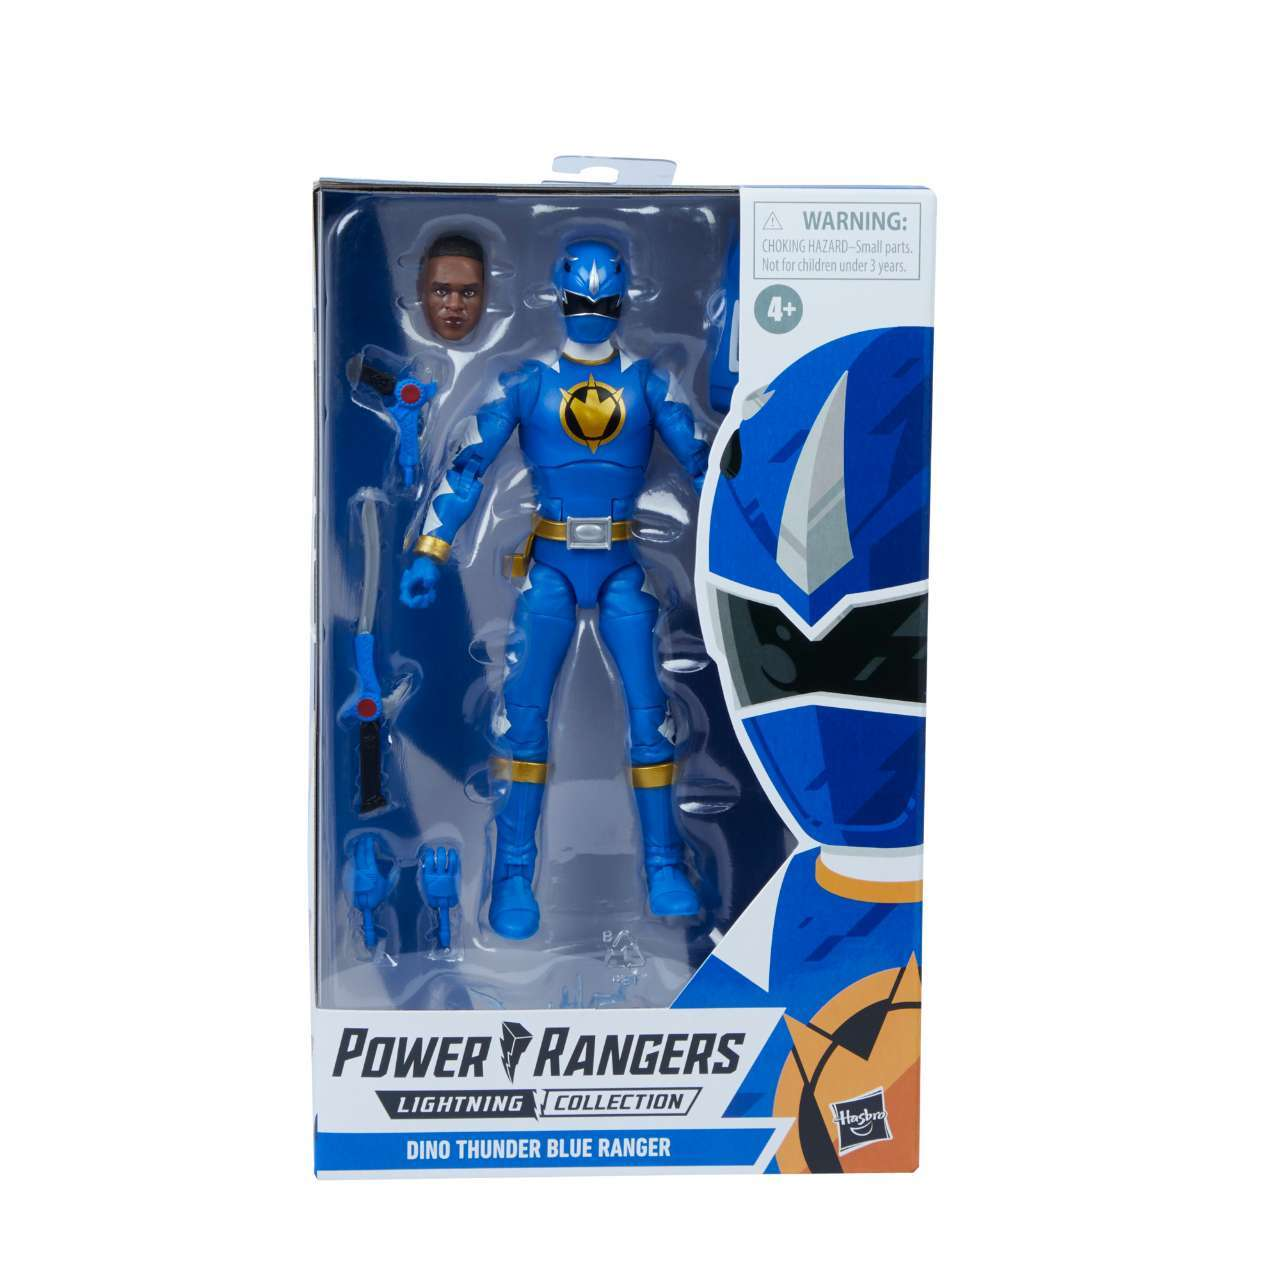 power-rangers-lightning-collection-F1427_PROD_PRG_BLT_LUM_EARTH_62A5455_Online_300DPI